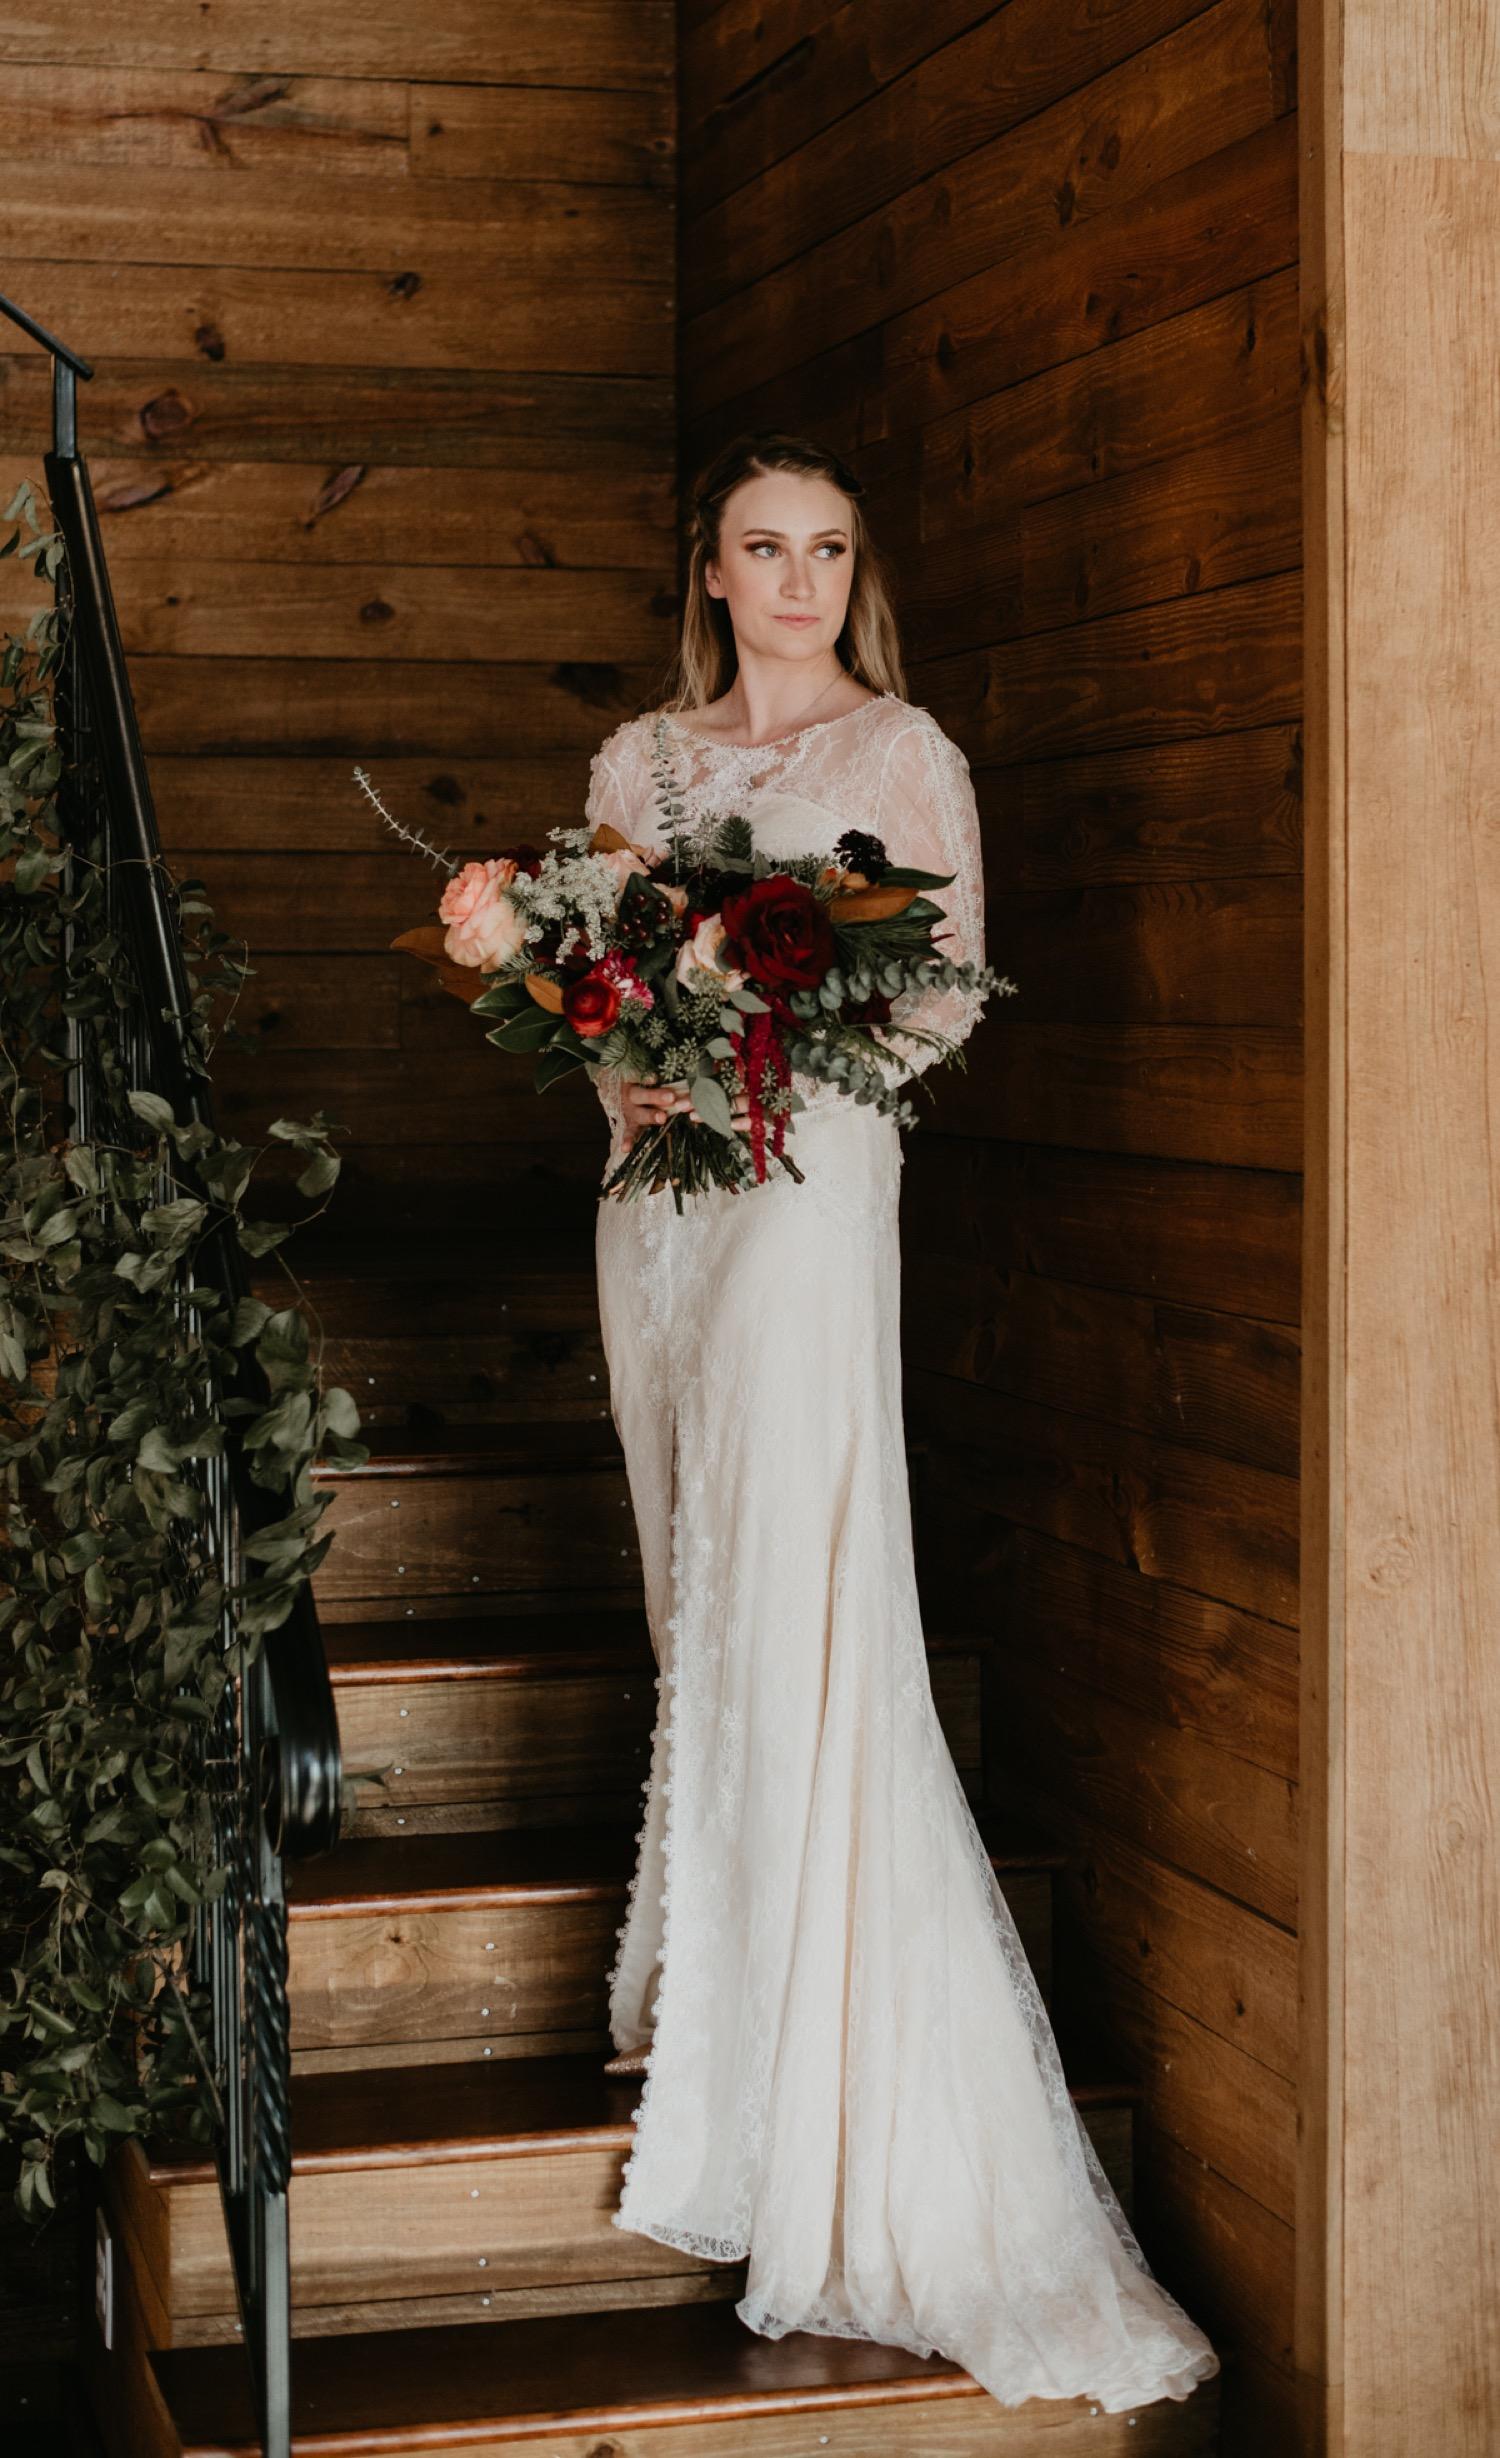 jesse-wedding-photographer-waco-texas-taylor-content.jpg